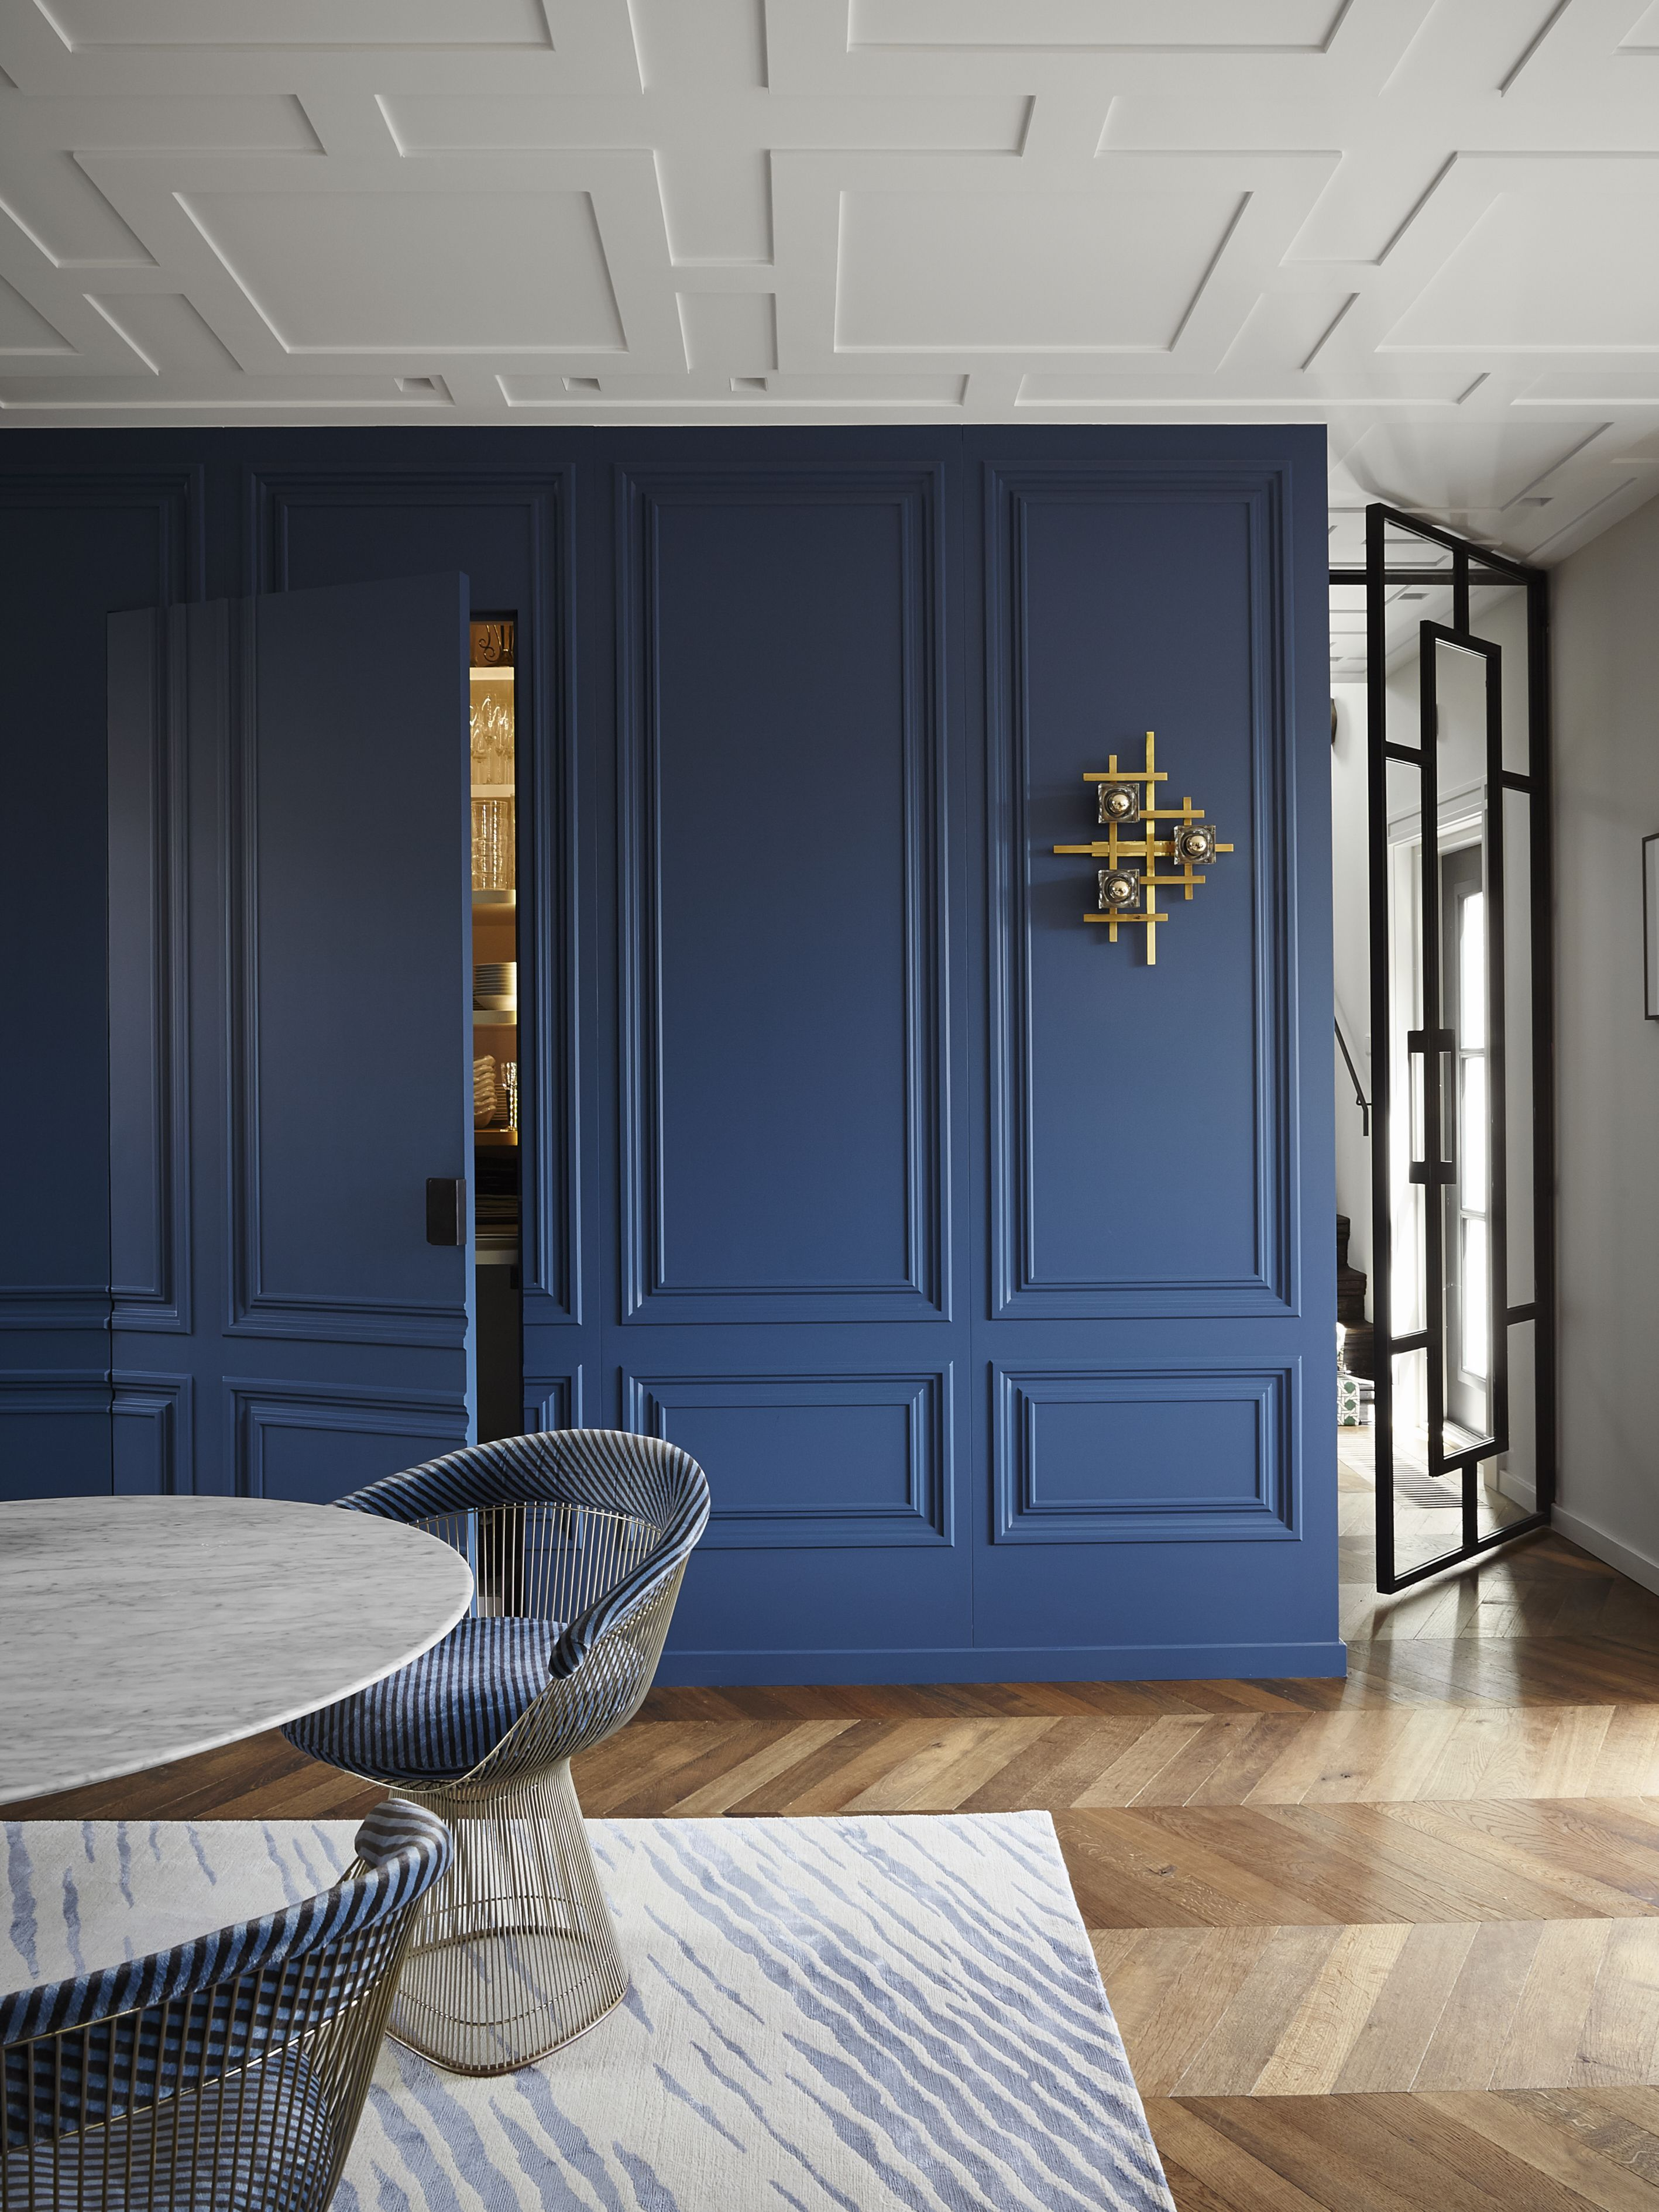 pin by valeria london on inspiration pinterest interior design